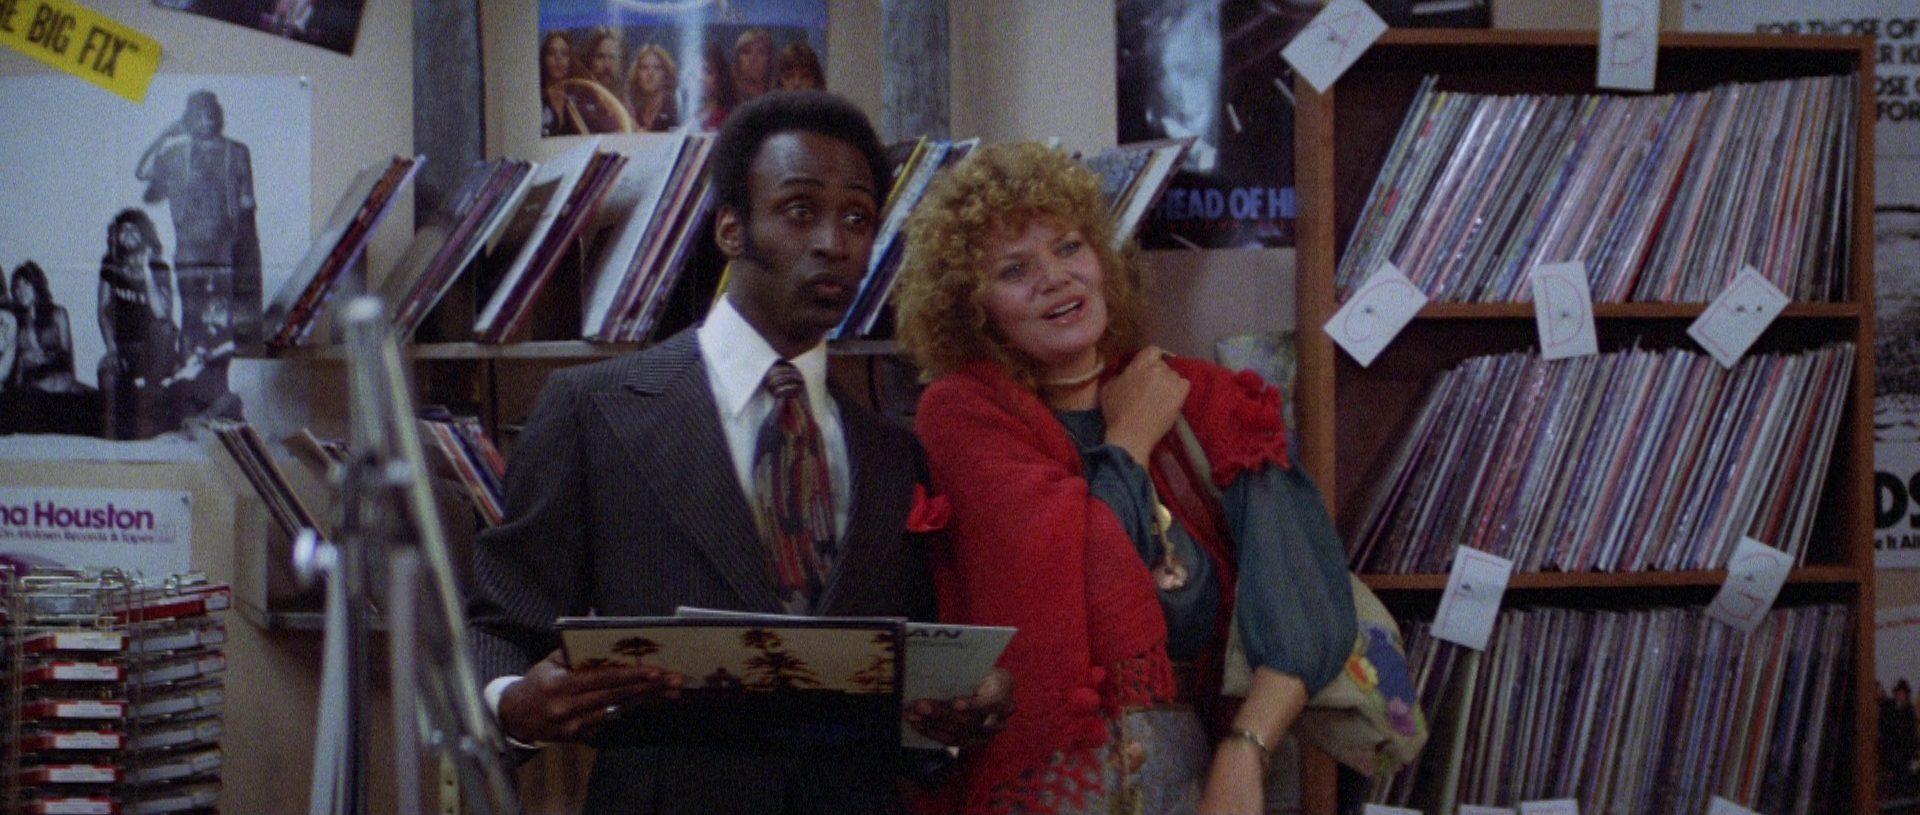 Szene aus 'FM(1978)', Copyright: Universal City Studios